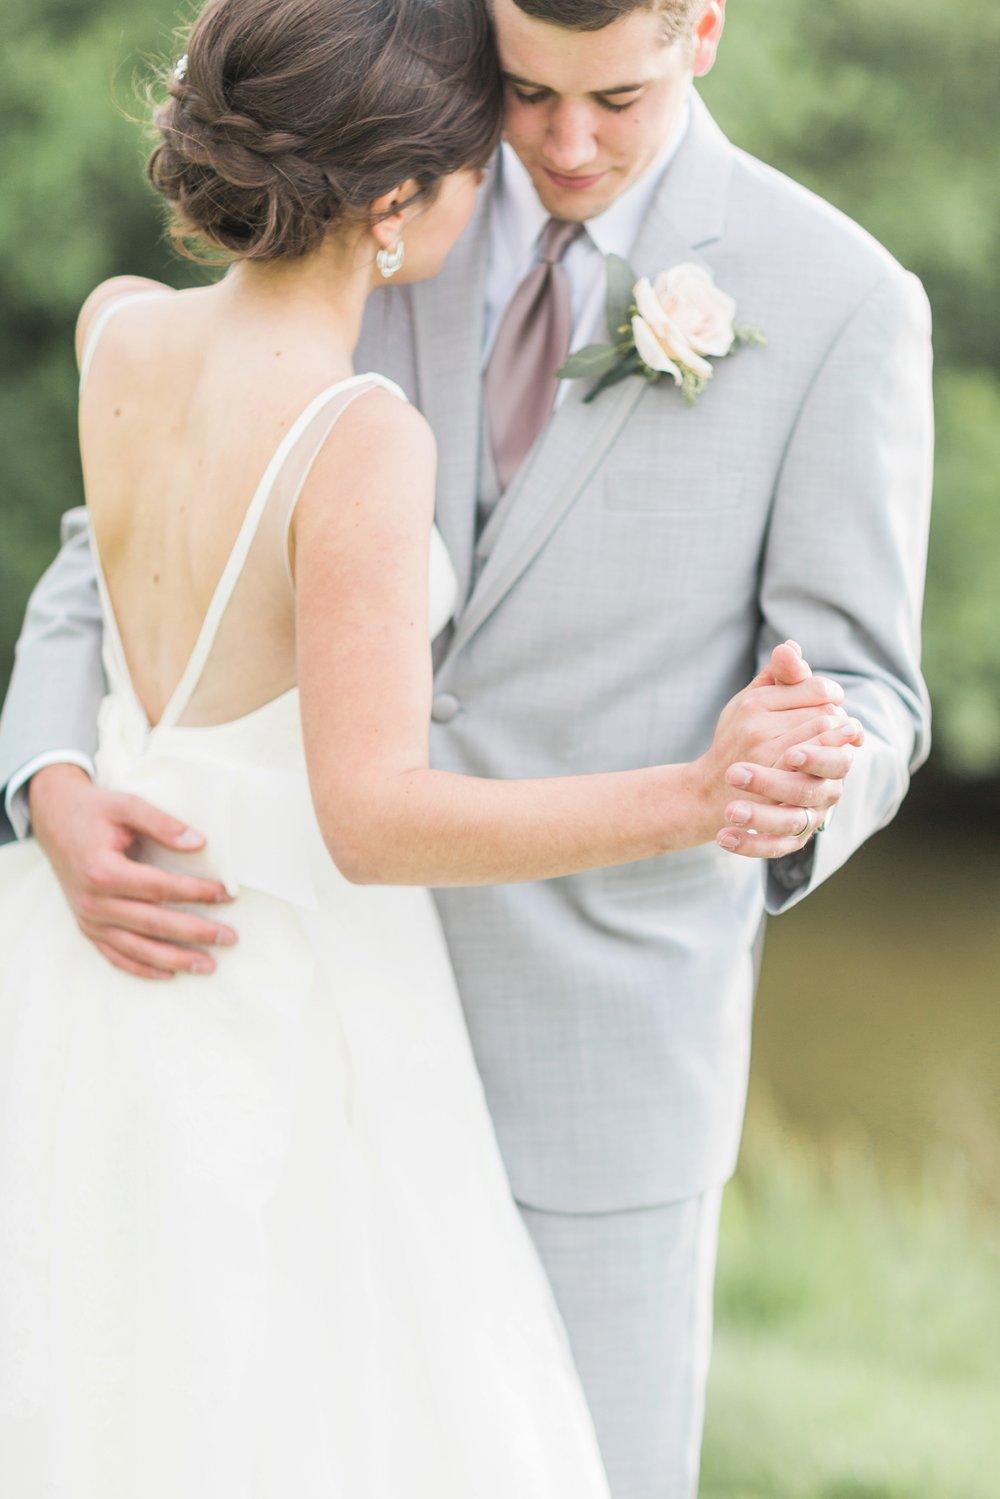 ivy-hills-country-club-weddings-cincinnati-ohio-chloe-luka-photography_9887.jpg